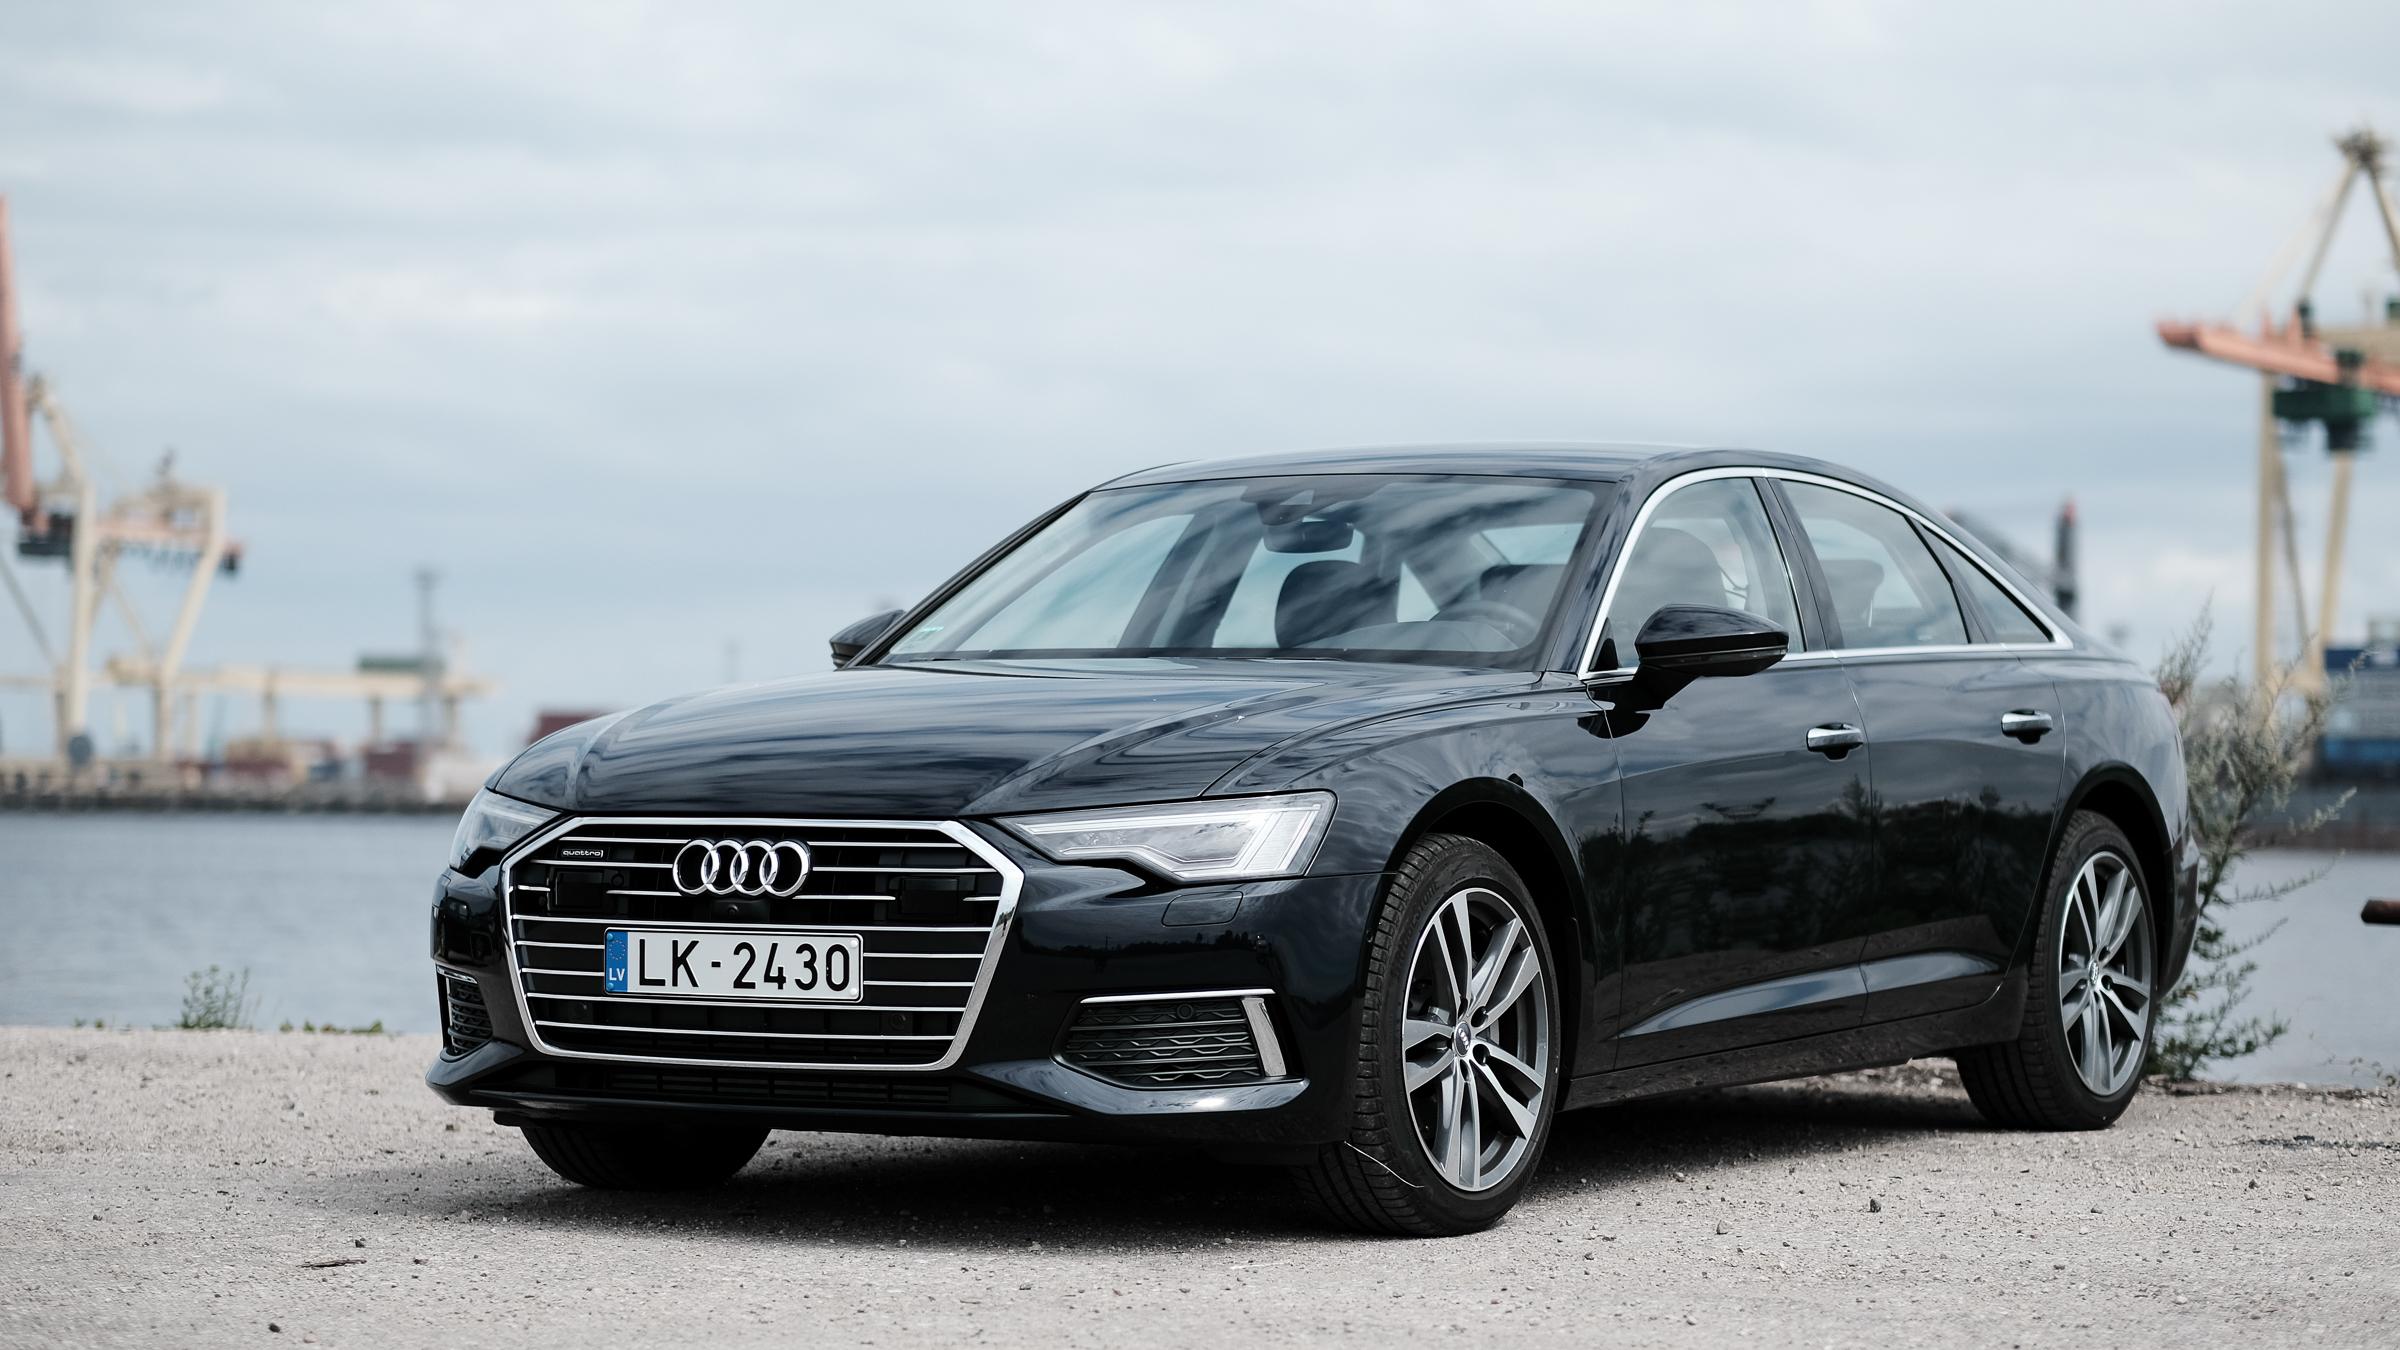 Kelebihan Audi A6 2018 Tangguh